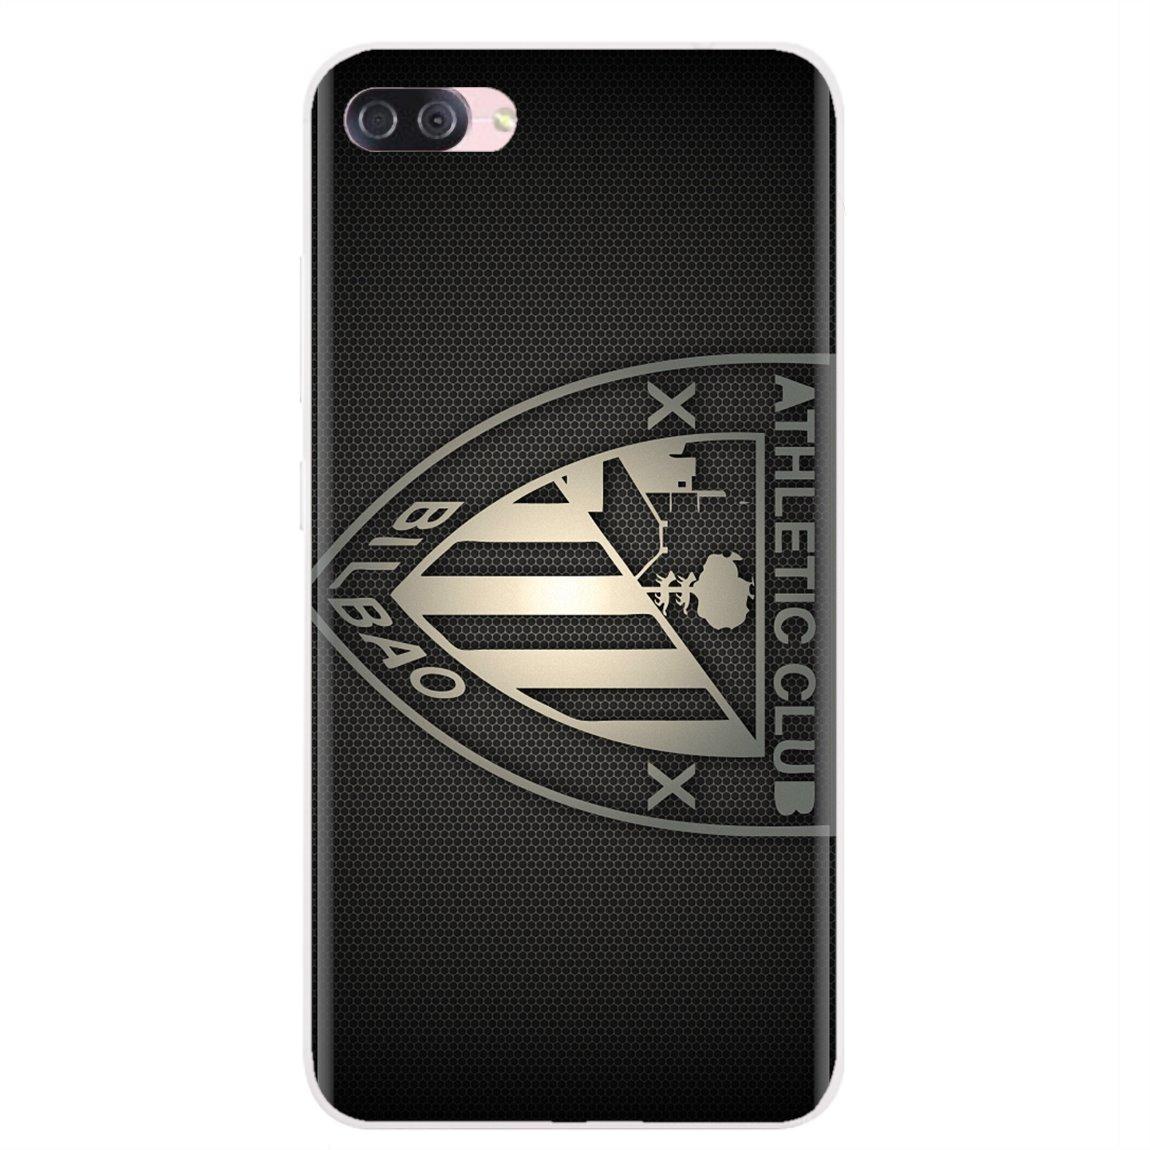 athletic club bilbao fc For Samsung Galaxy Note 2 3 4 5 8 9 S2 S3 S4 S5 Mini S6 S7 Edge S8 S9 Plus Beautiful Silicone Phone Case